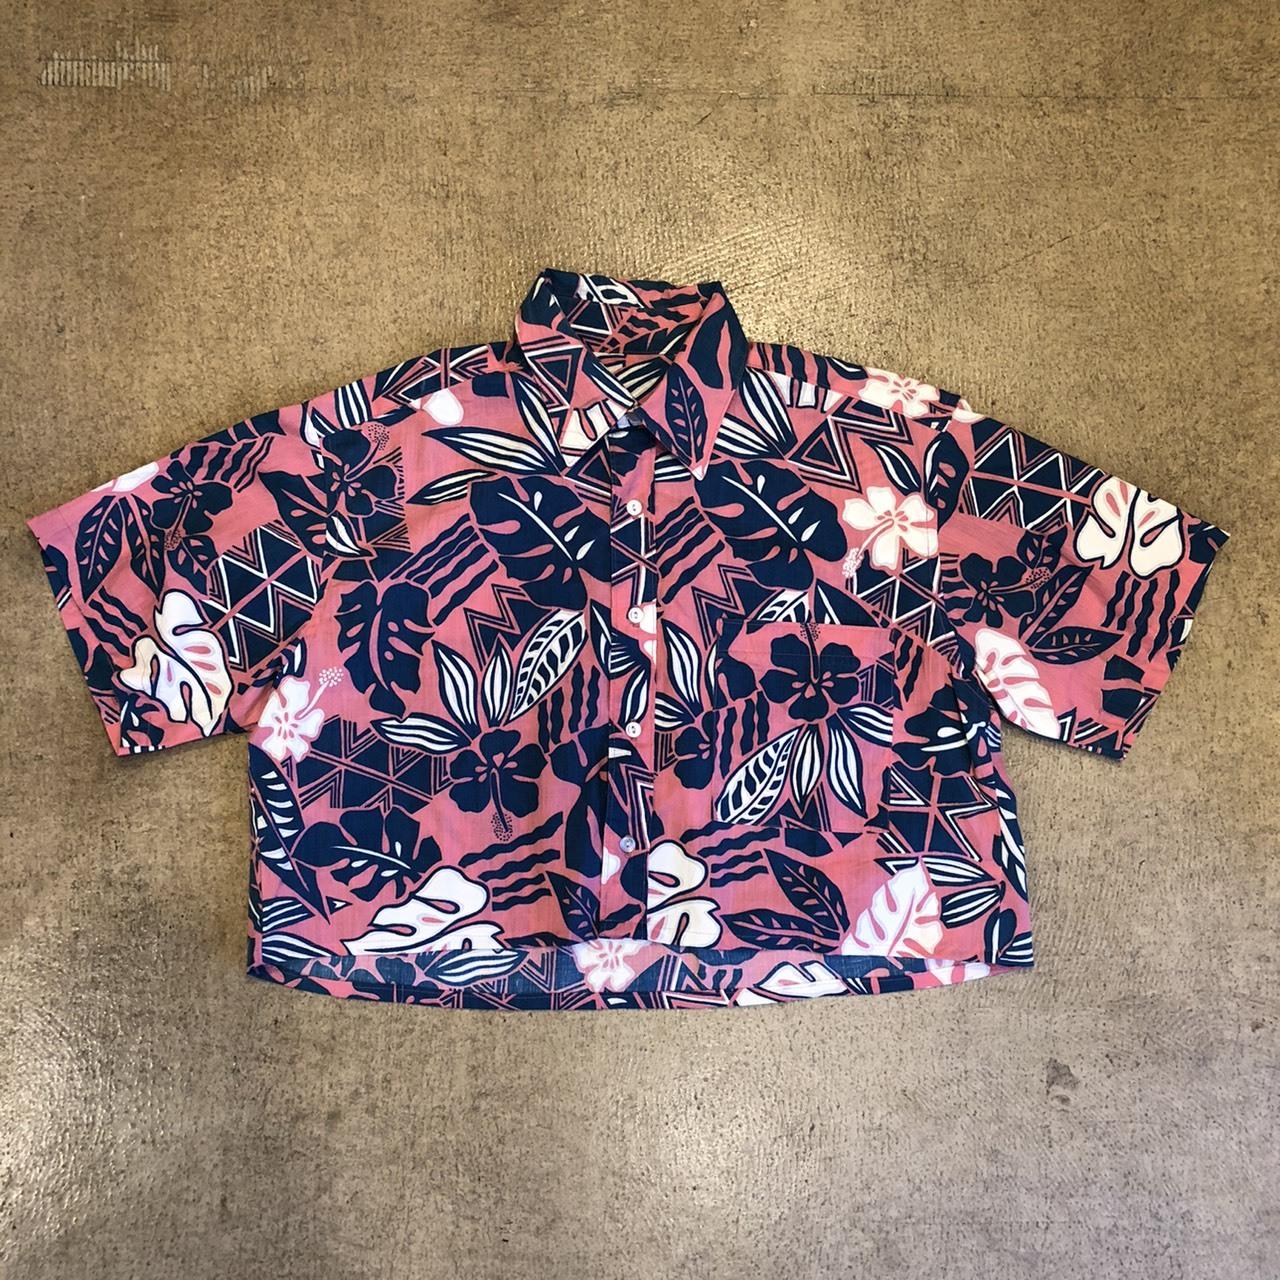 Remake Aloha Shirts No.4 ¥5,900+tax